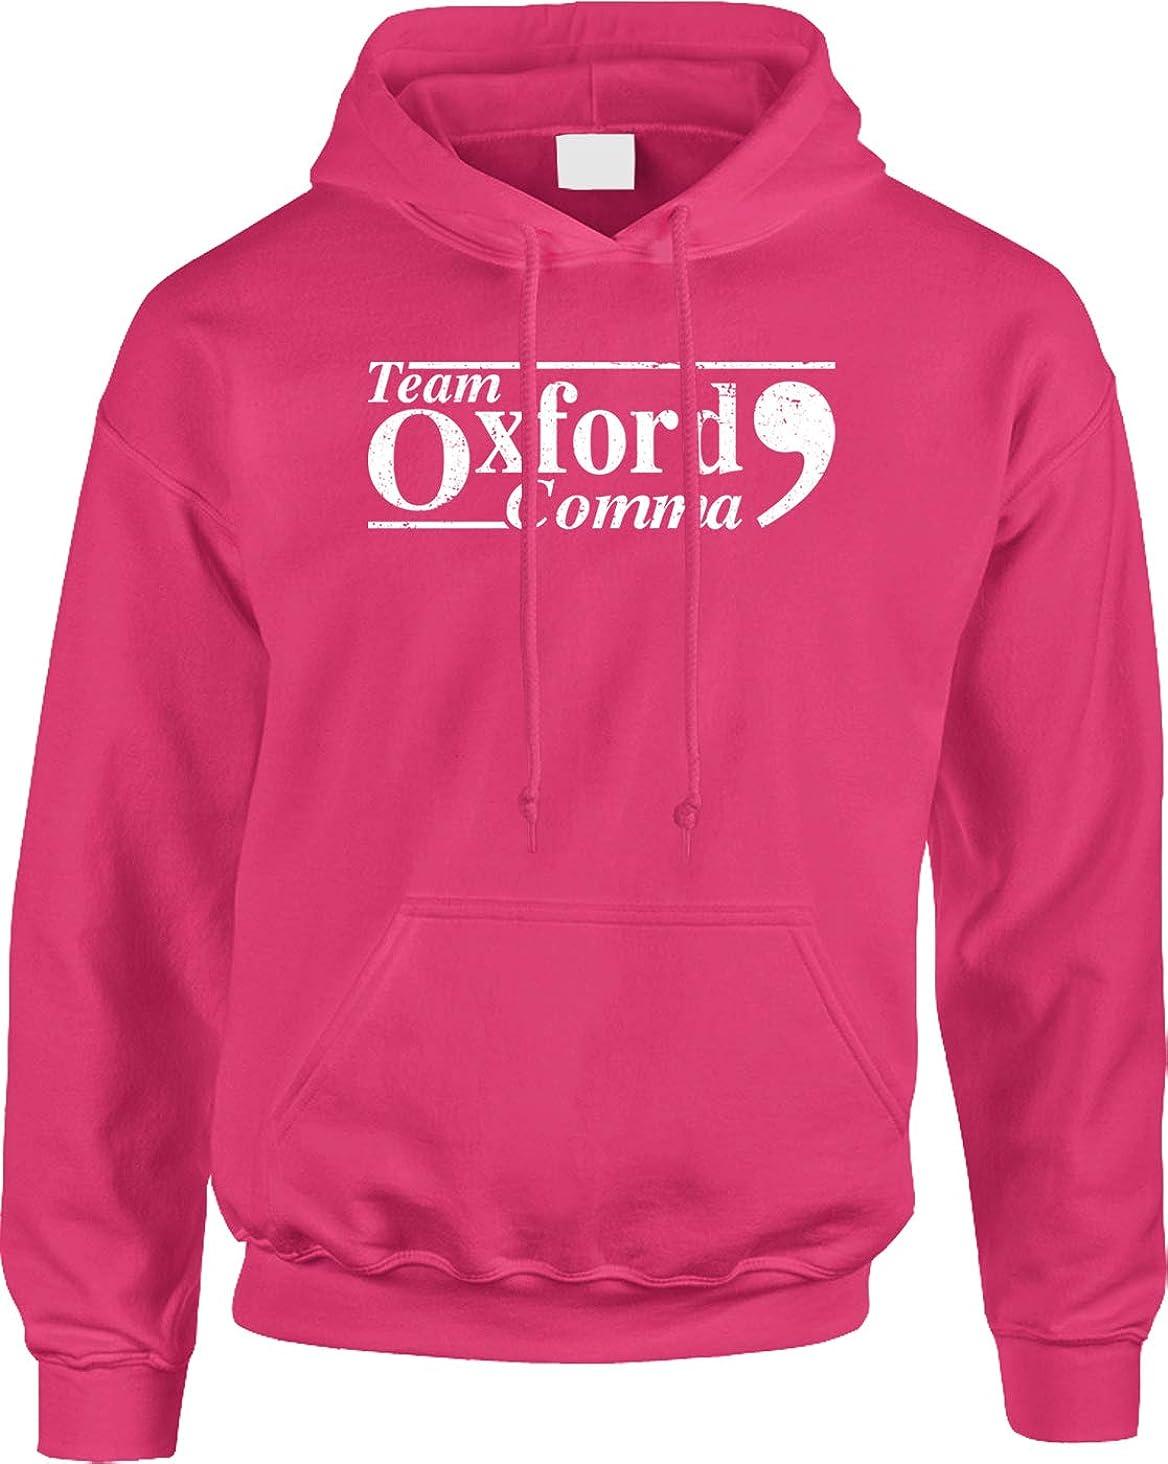 Blittzen Mens Hoodie Team Oxford Comma - Punctuation Proud